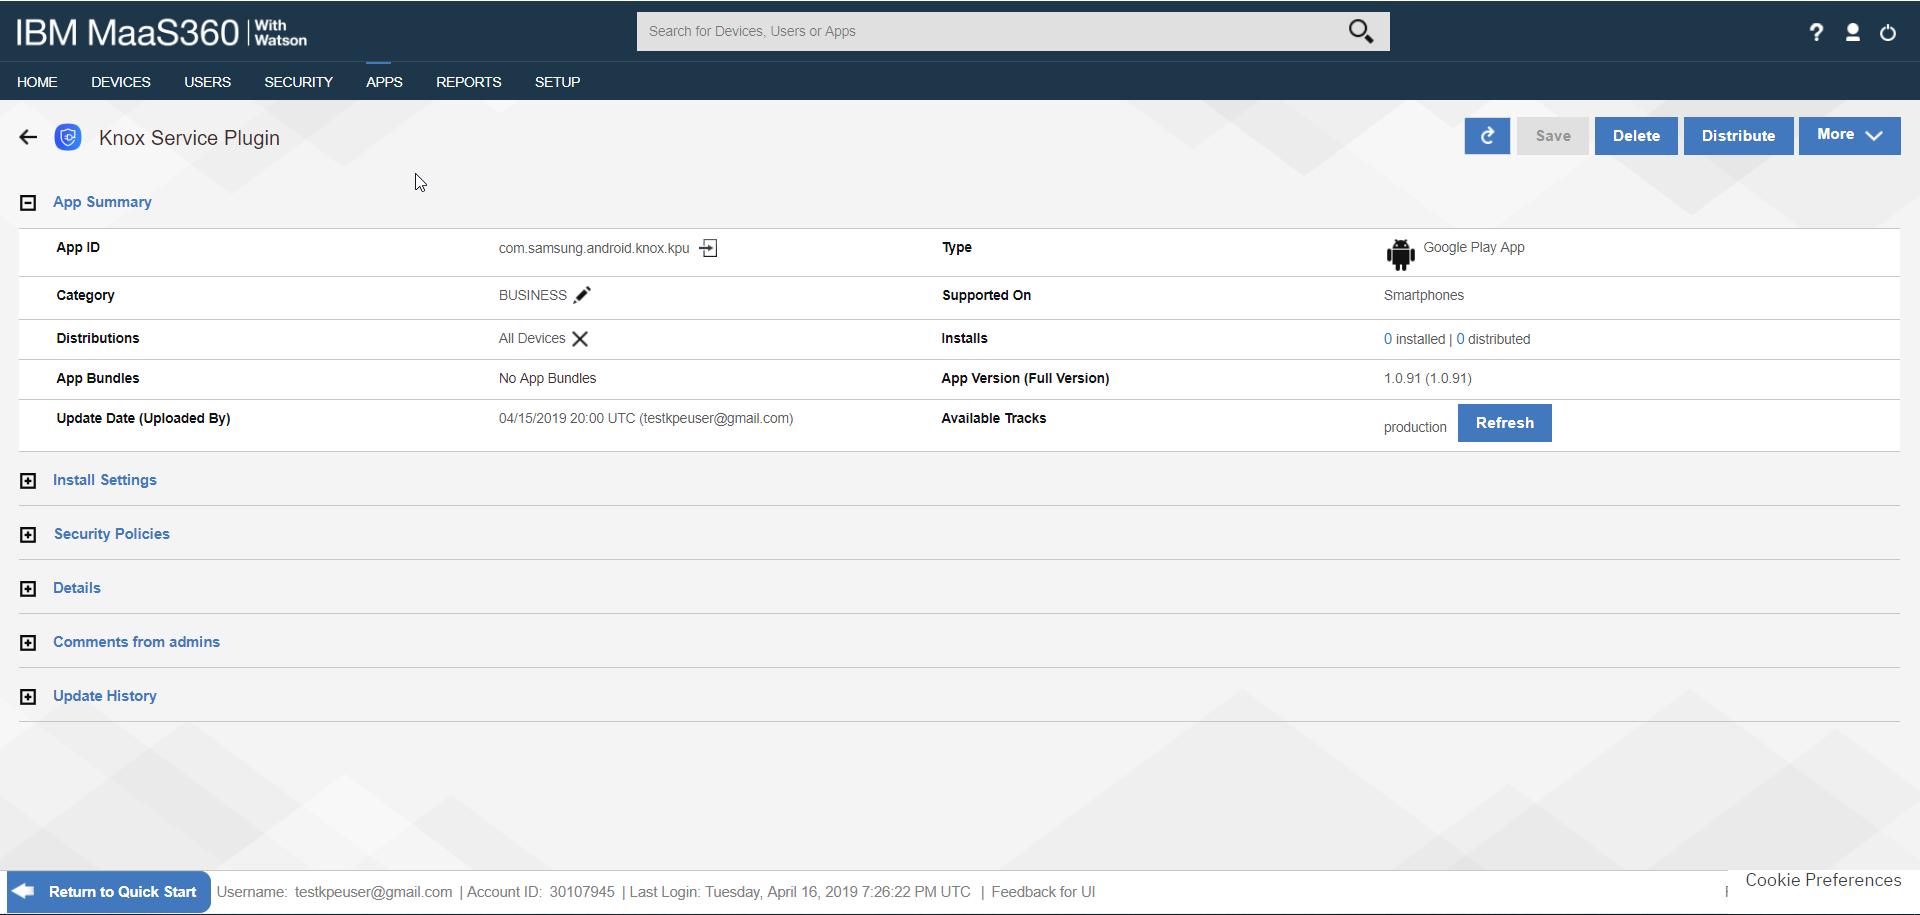 Deploy KSP - IBM MaaS360 App Catalog - KSP Page